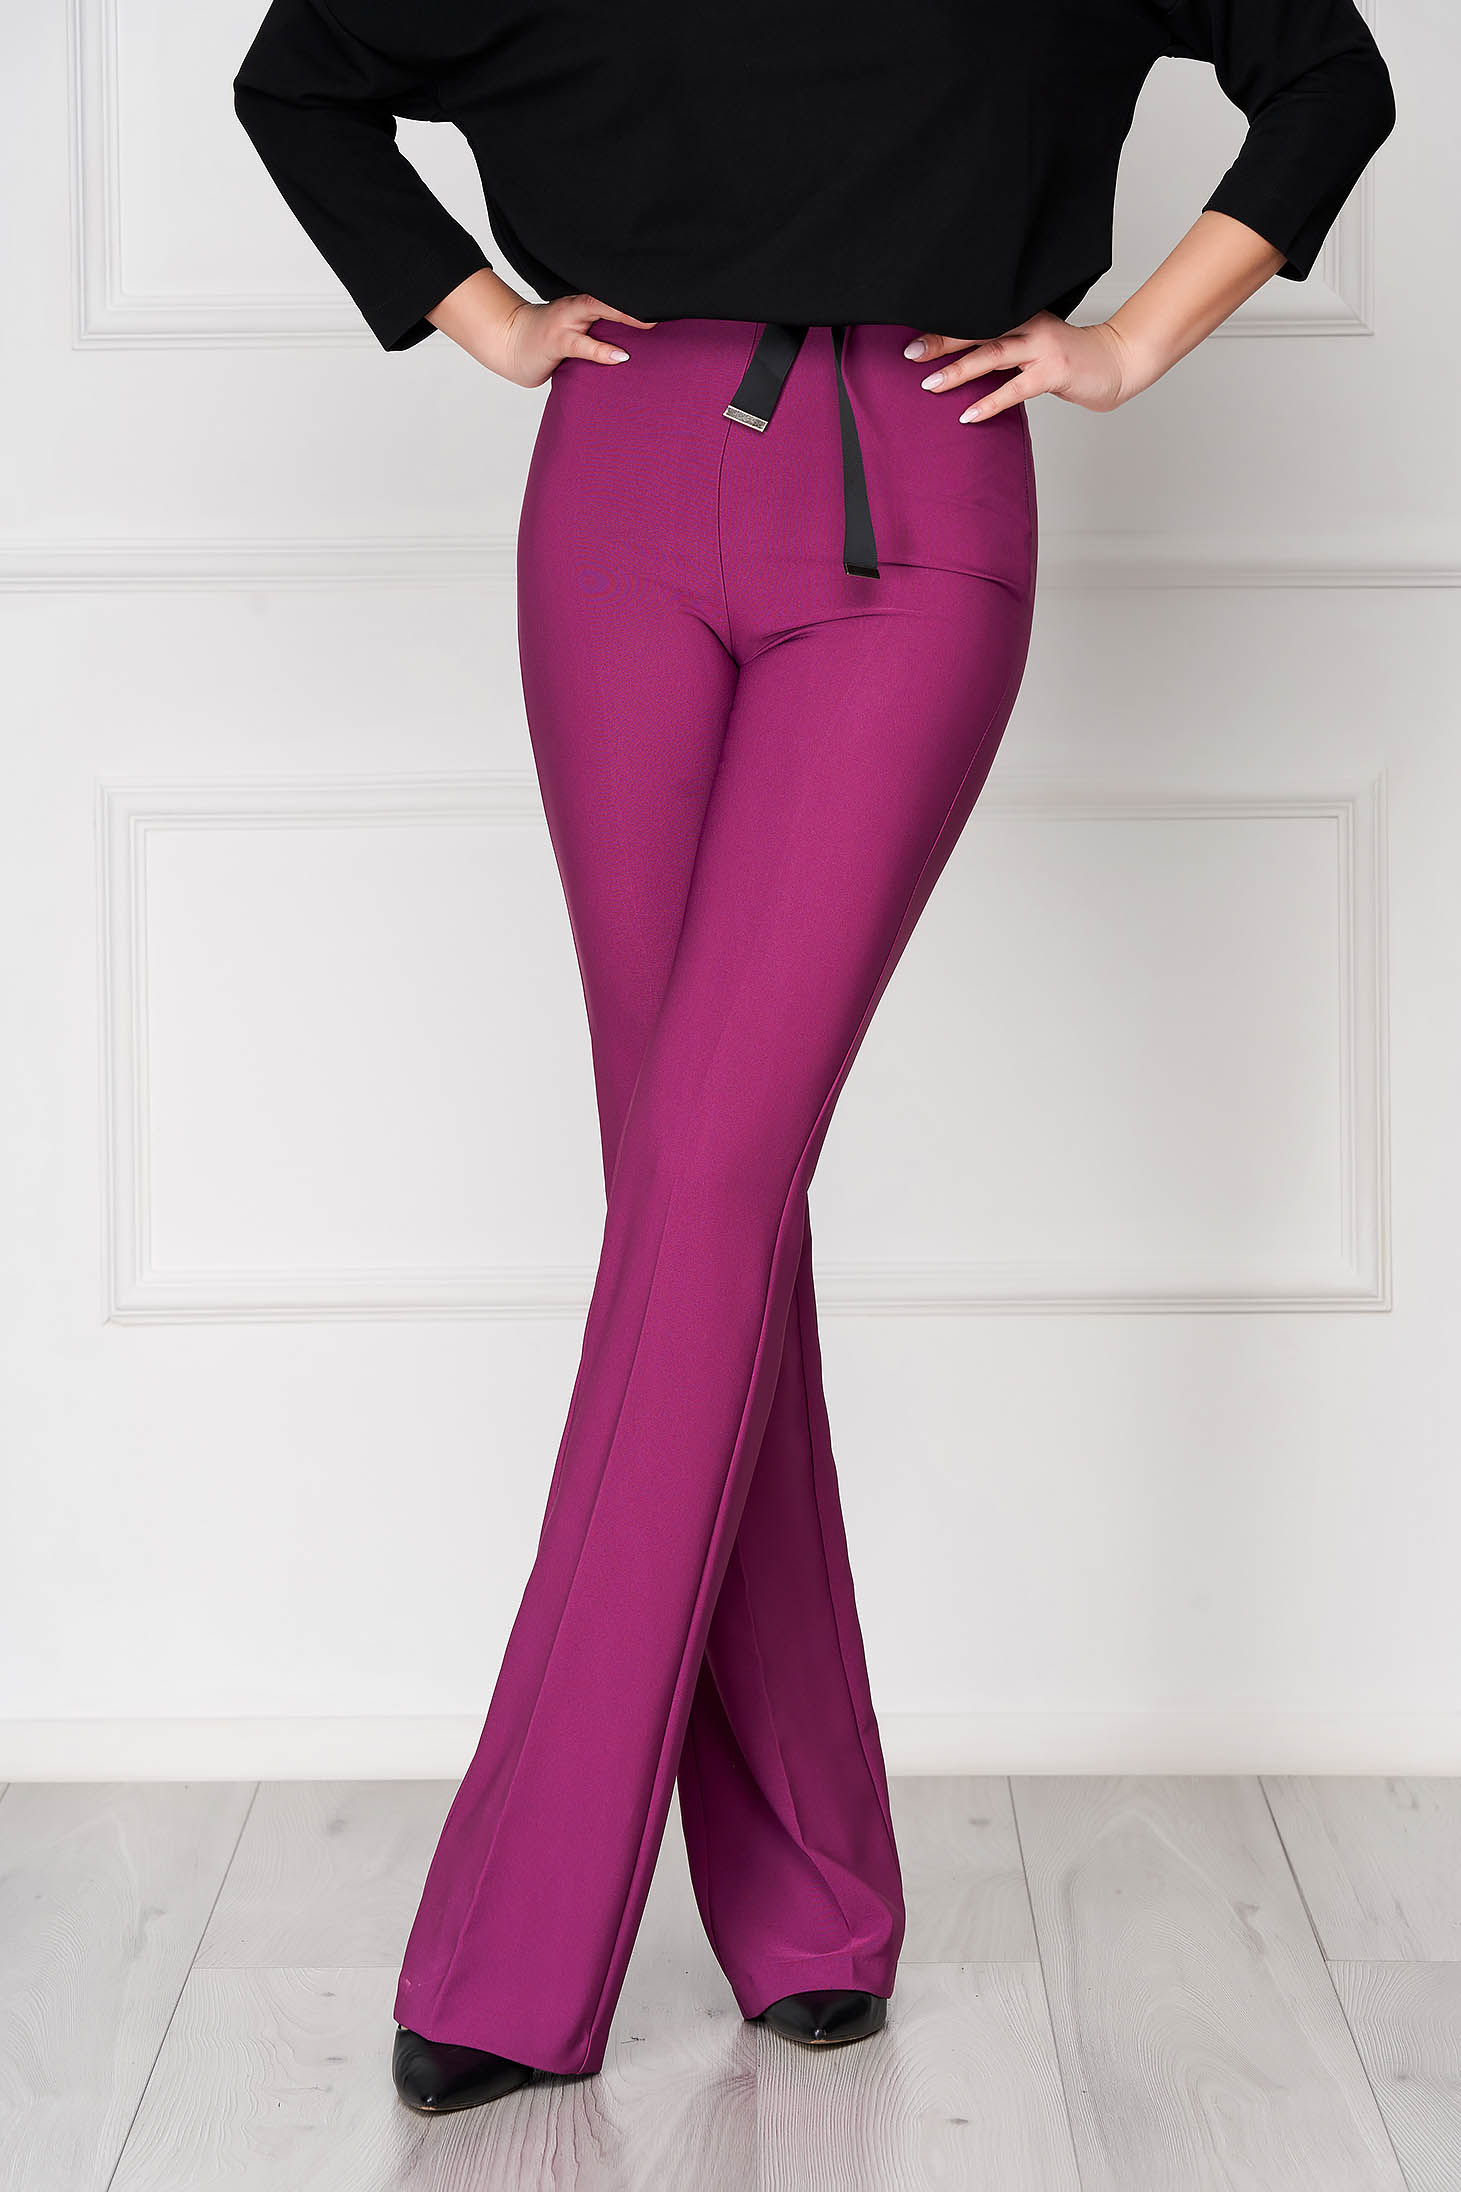 PrettyGirl purple elegant flared trousers high waisted nonelastic fabric